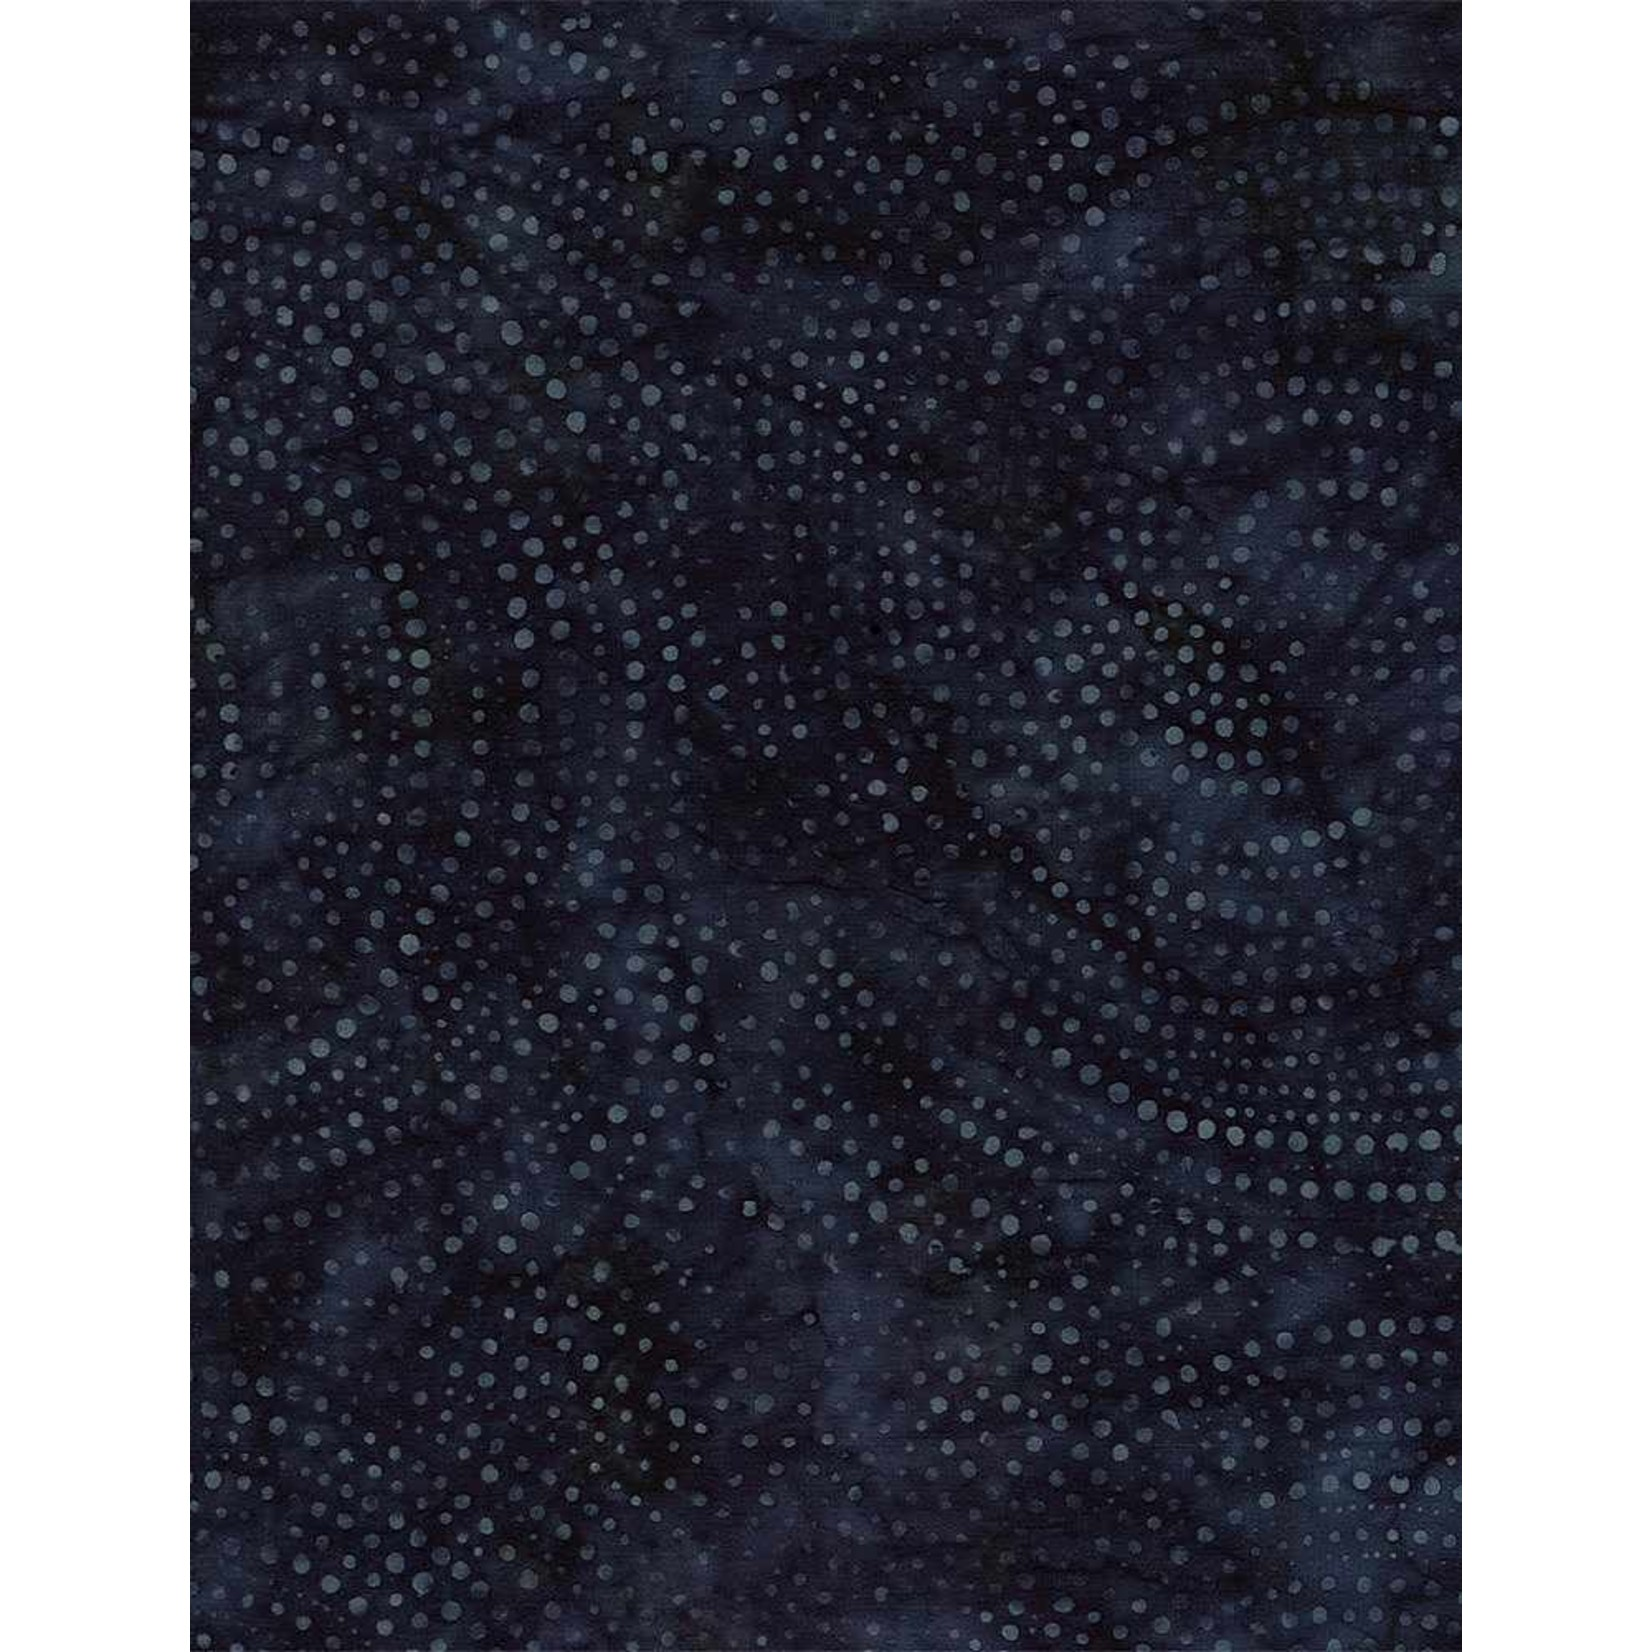 Timeless Treasures Tonga - Batik - Cosmos - Dotty - Spiral